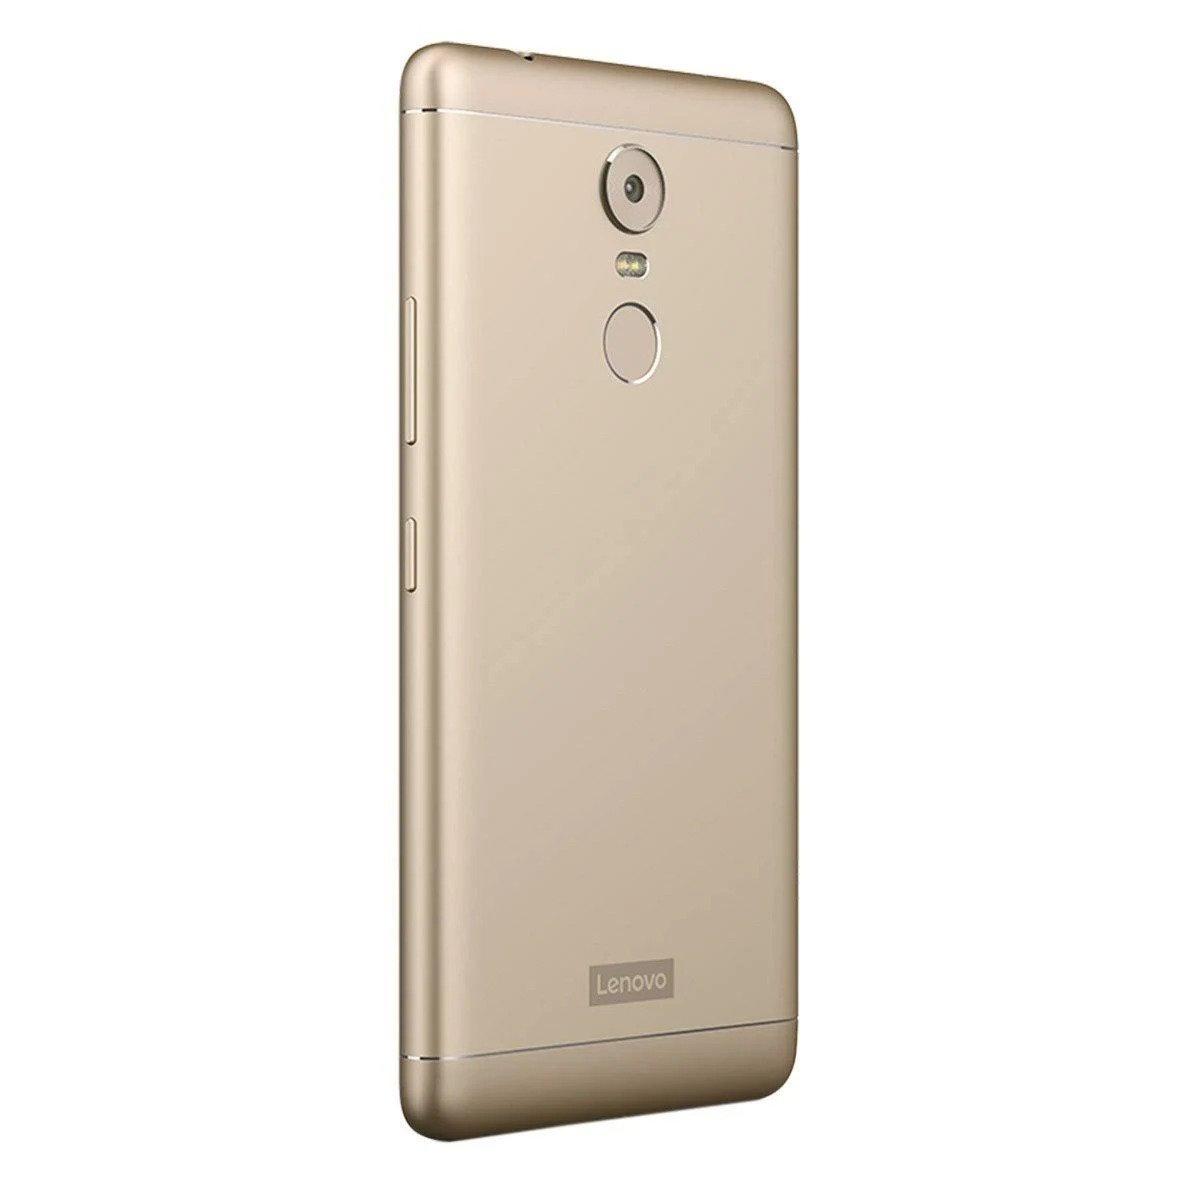 Smartphone Lenovo Vike K6 Plus 32GB - Excelente